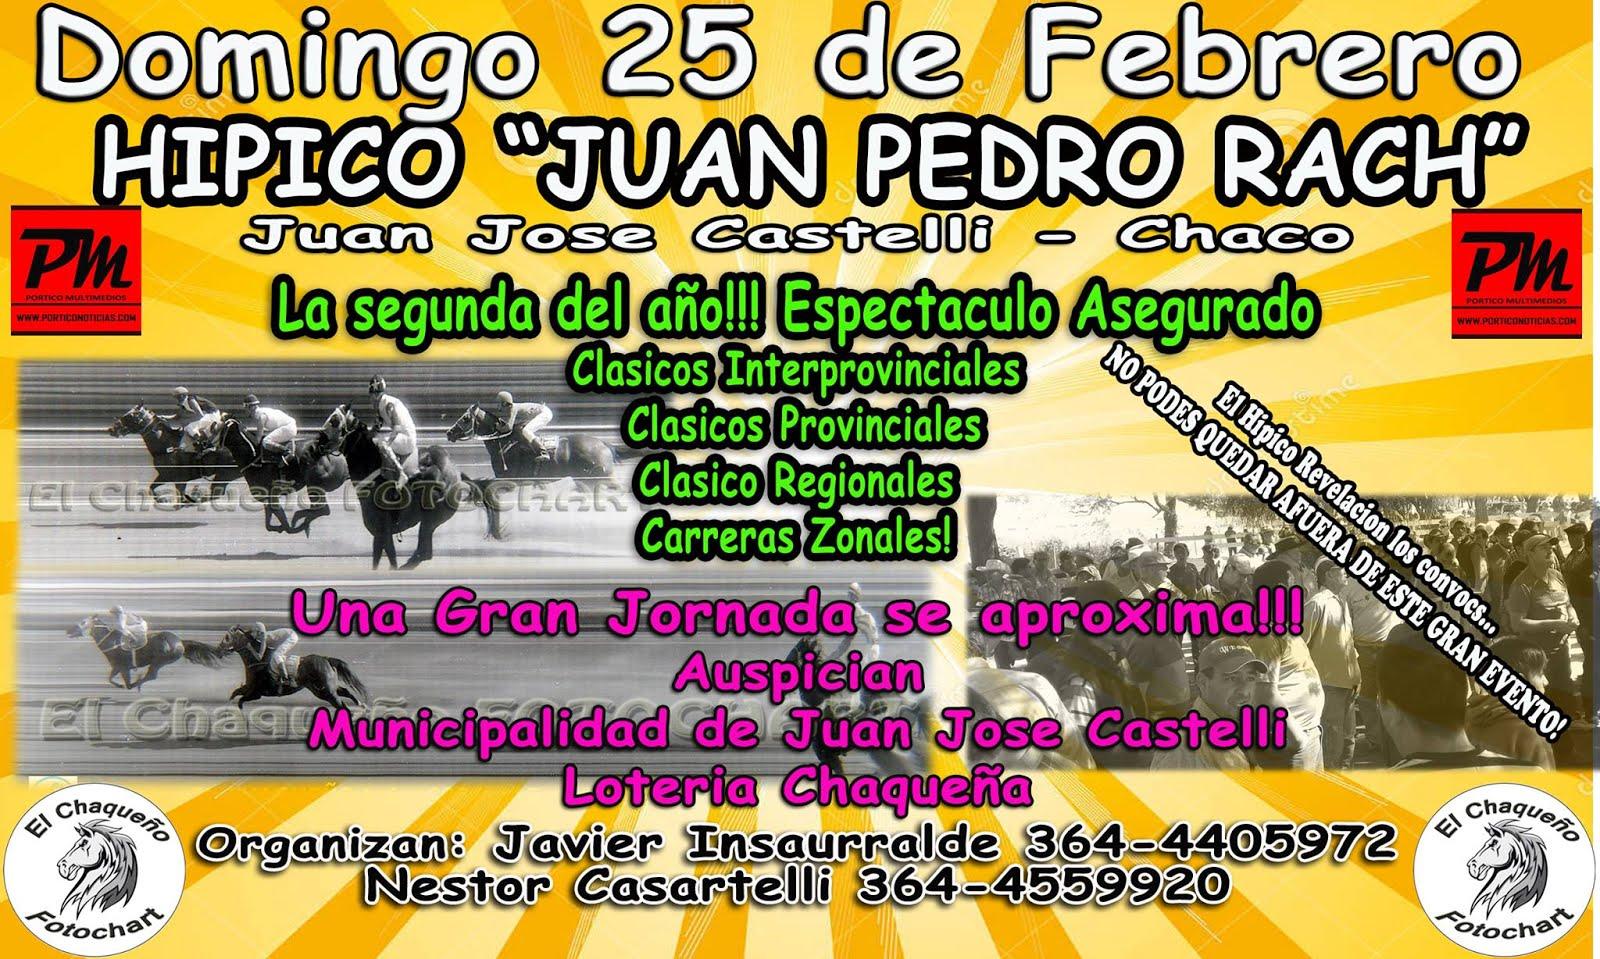 25/2 febrero castelli